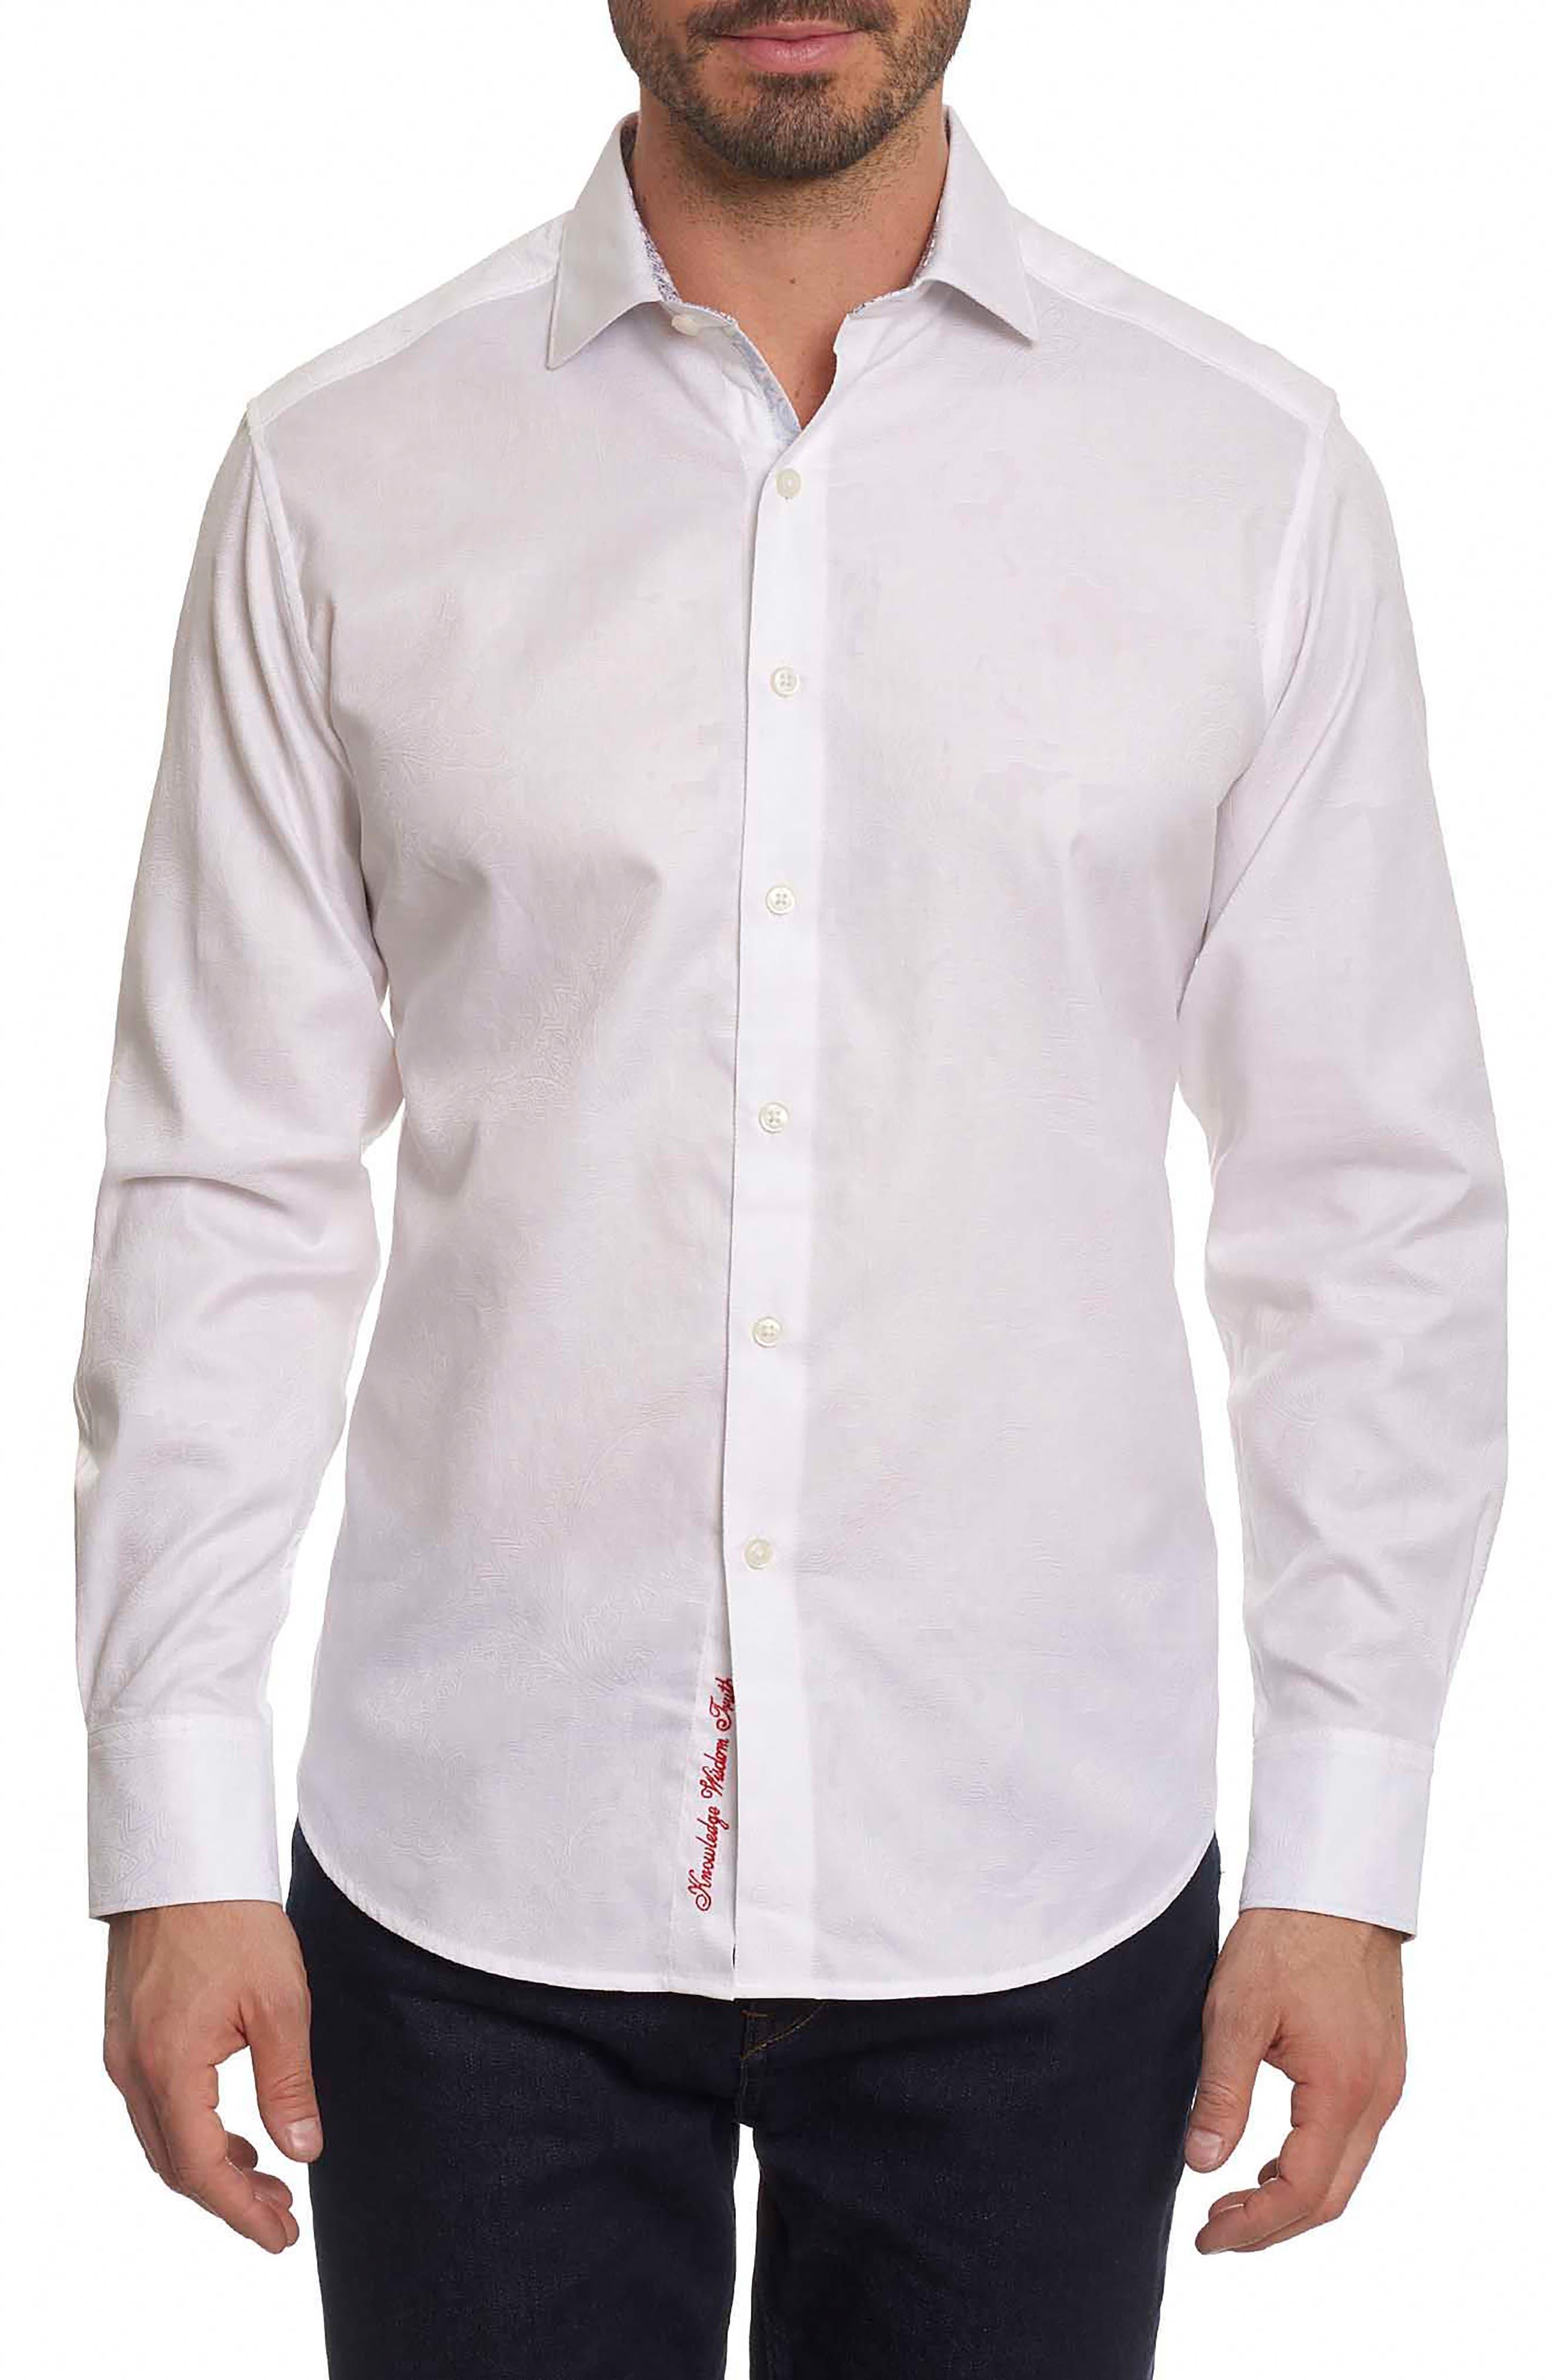 Alternate Image 1 Selected - Robert Graham Rosendale Classic Fit Jacquard Sport Shirt